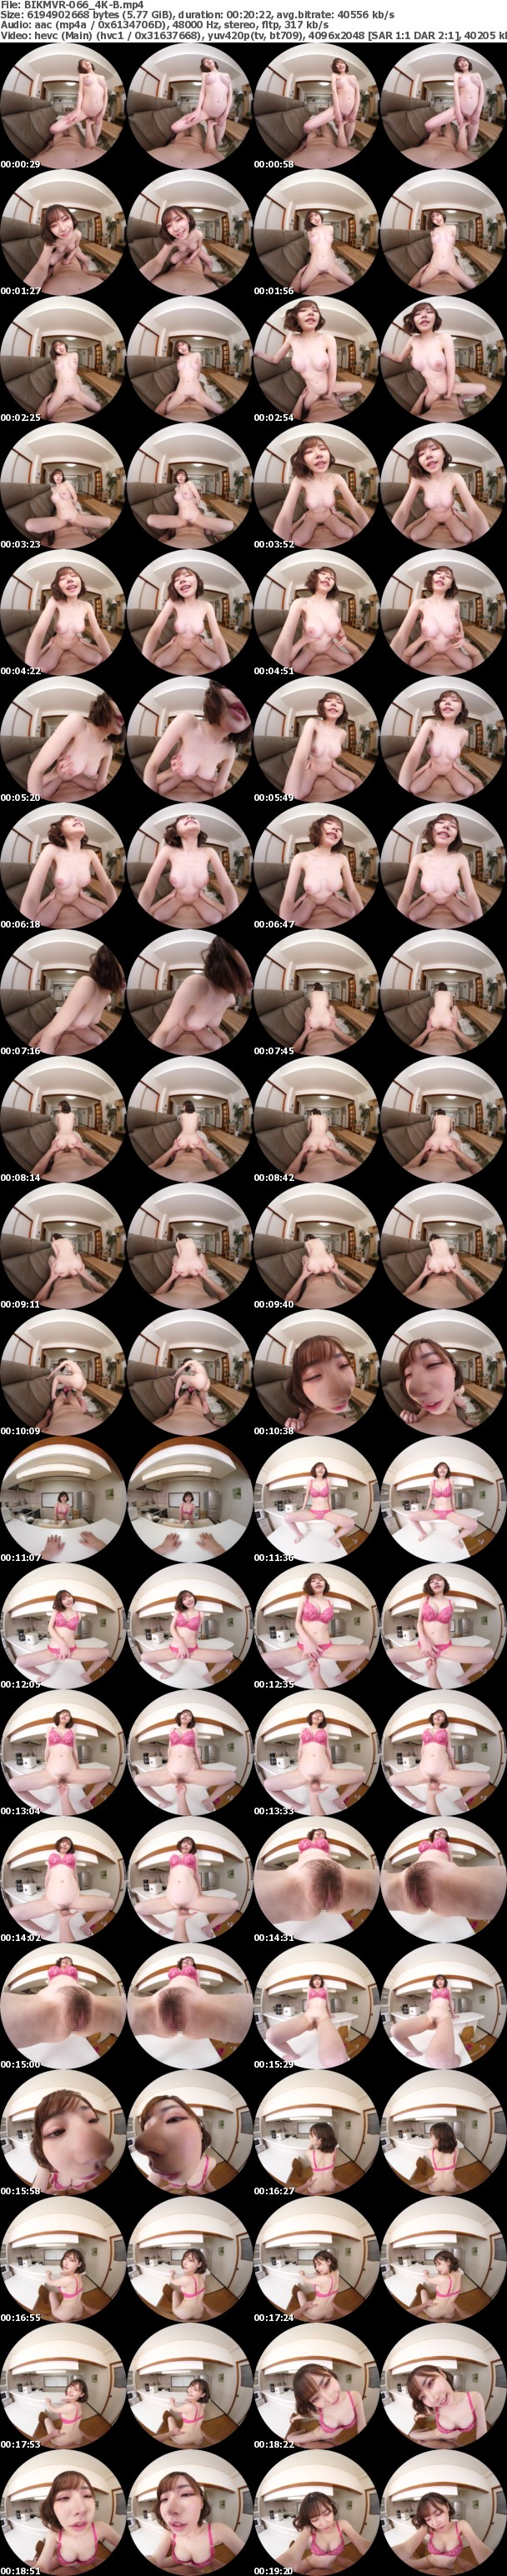 (VR) BIKMVR-066 【4K匠】新世代美女の凄テク射精術!口で!膣で!発射不可避のエロスキルで一日中男を満足させるSEXの天才 深田えいみ